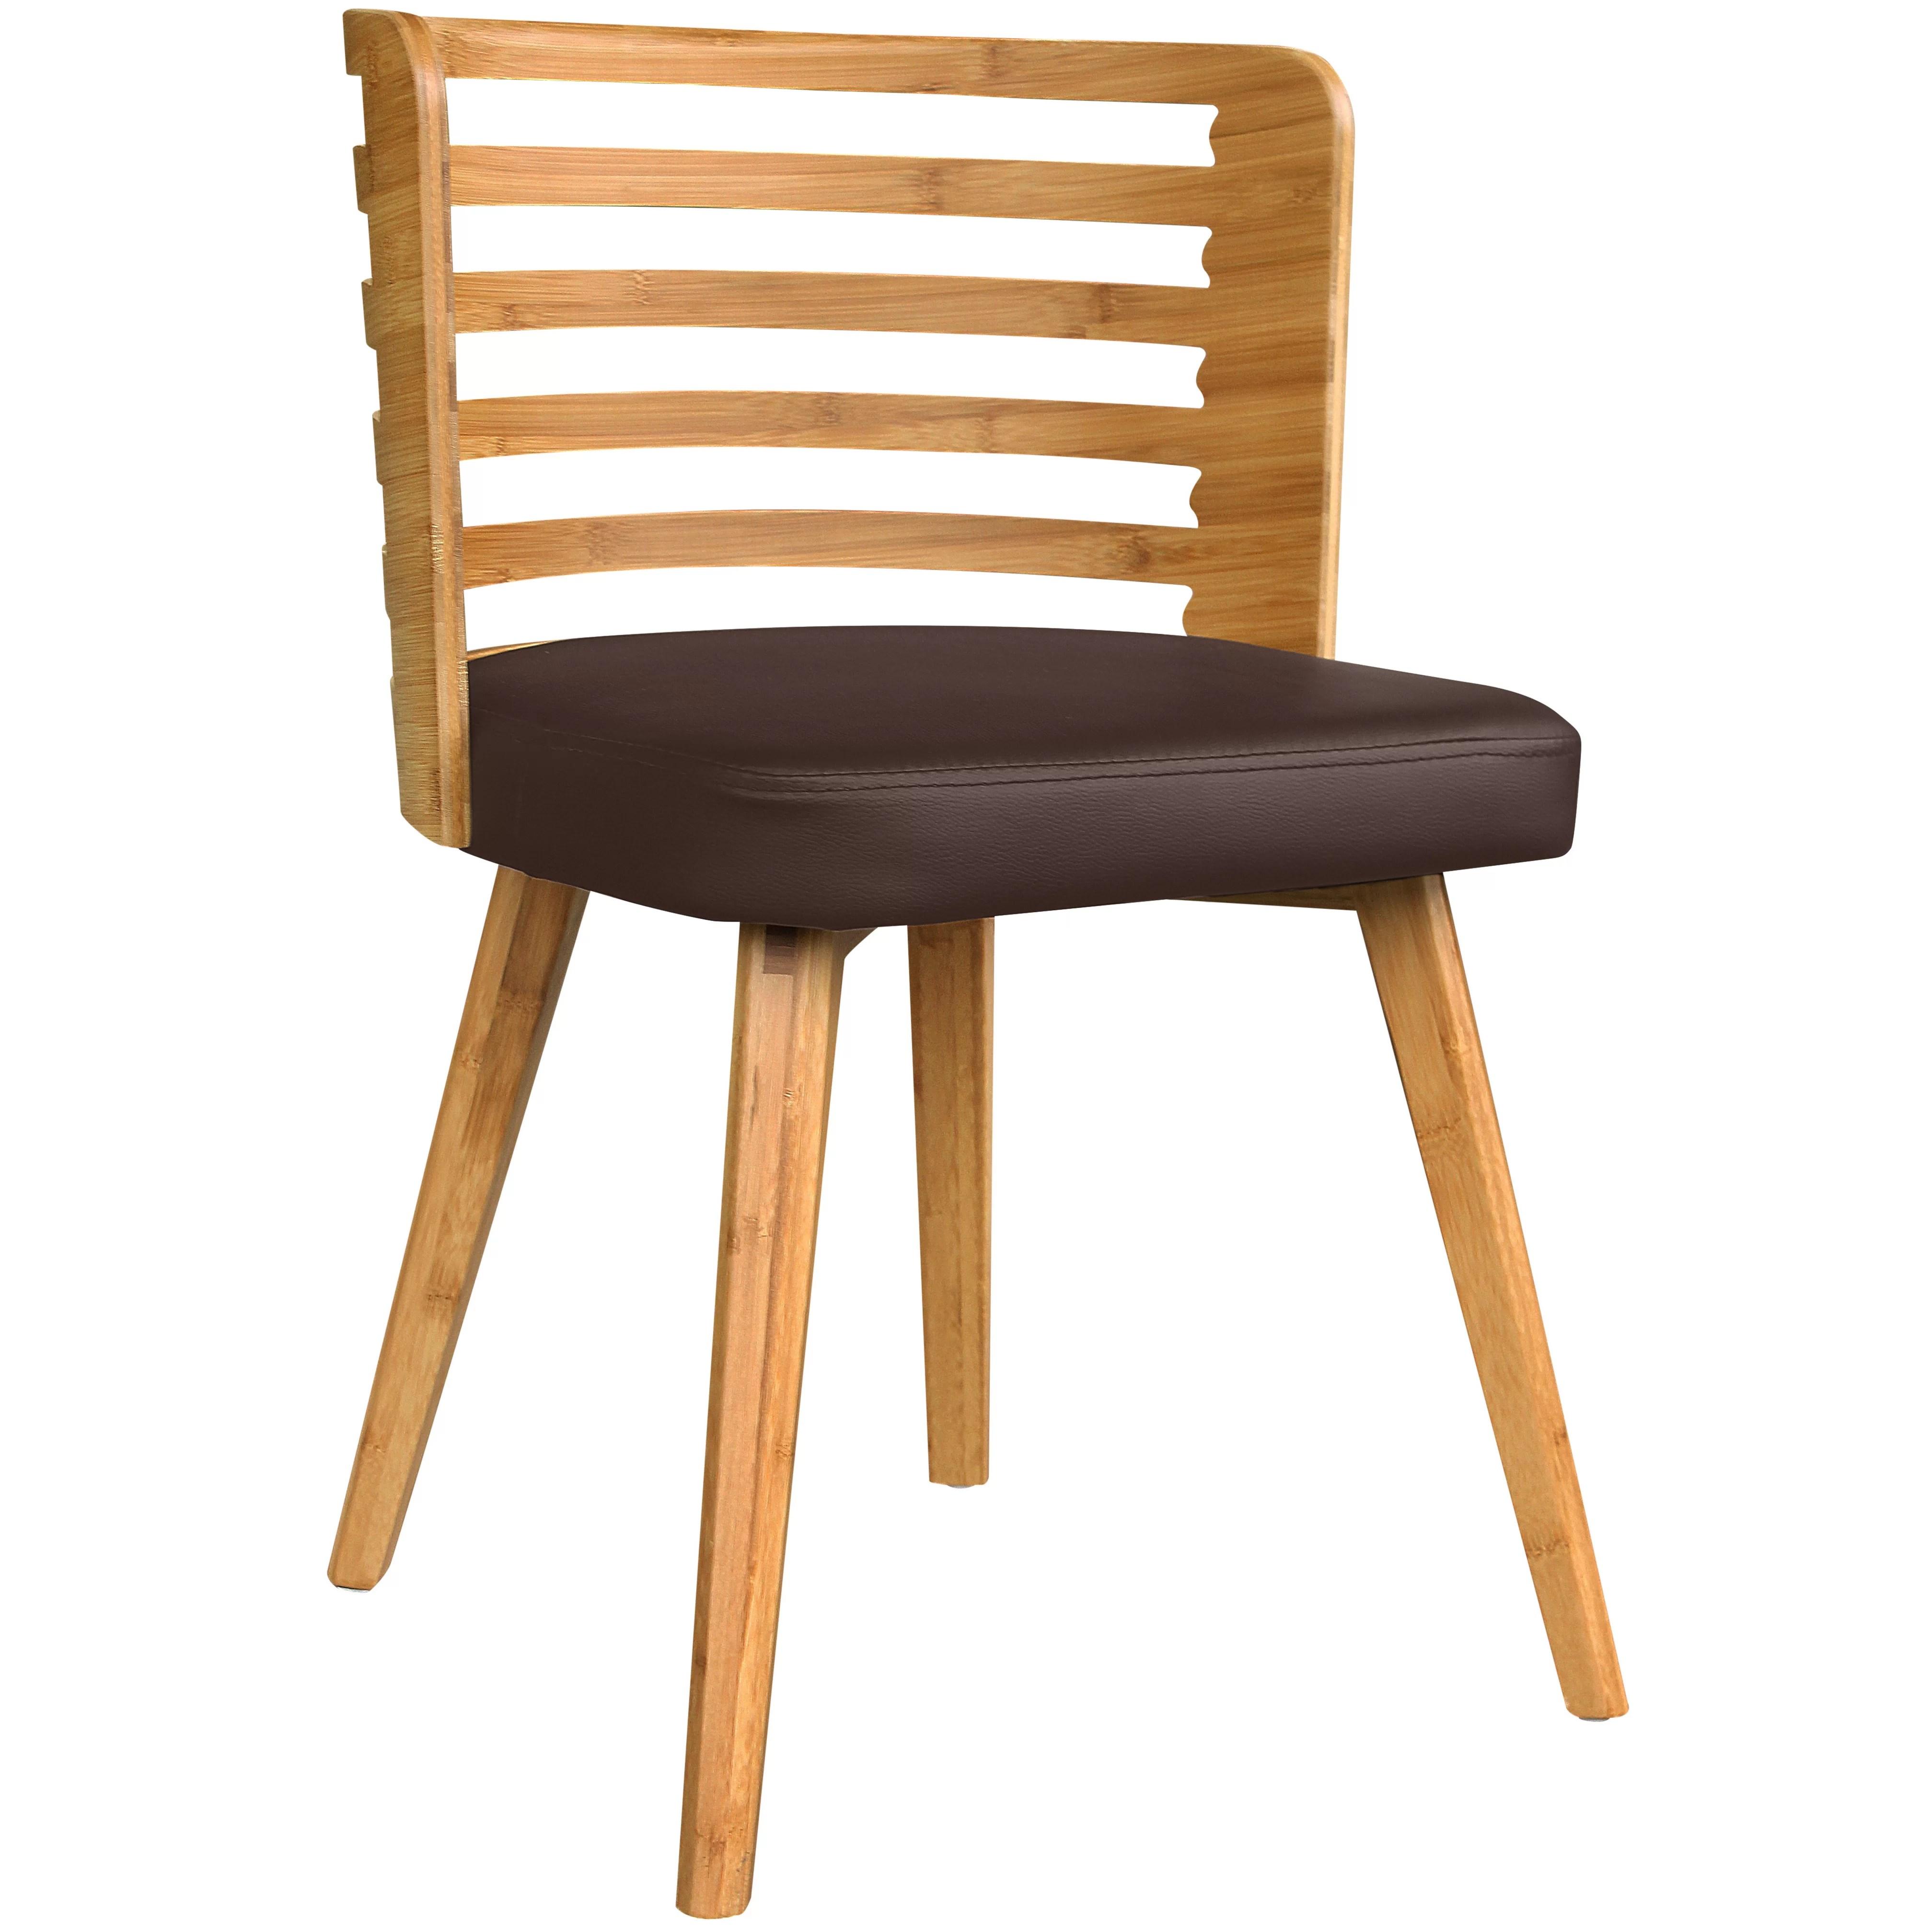 bamboo dining chair tokuyo massage brayden studio westhoff upholstered wayfair